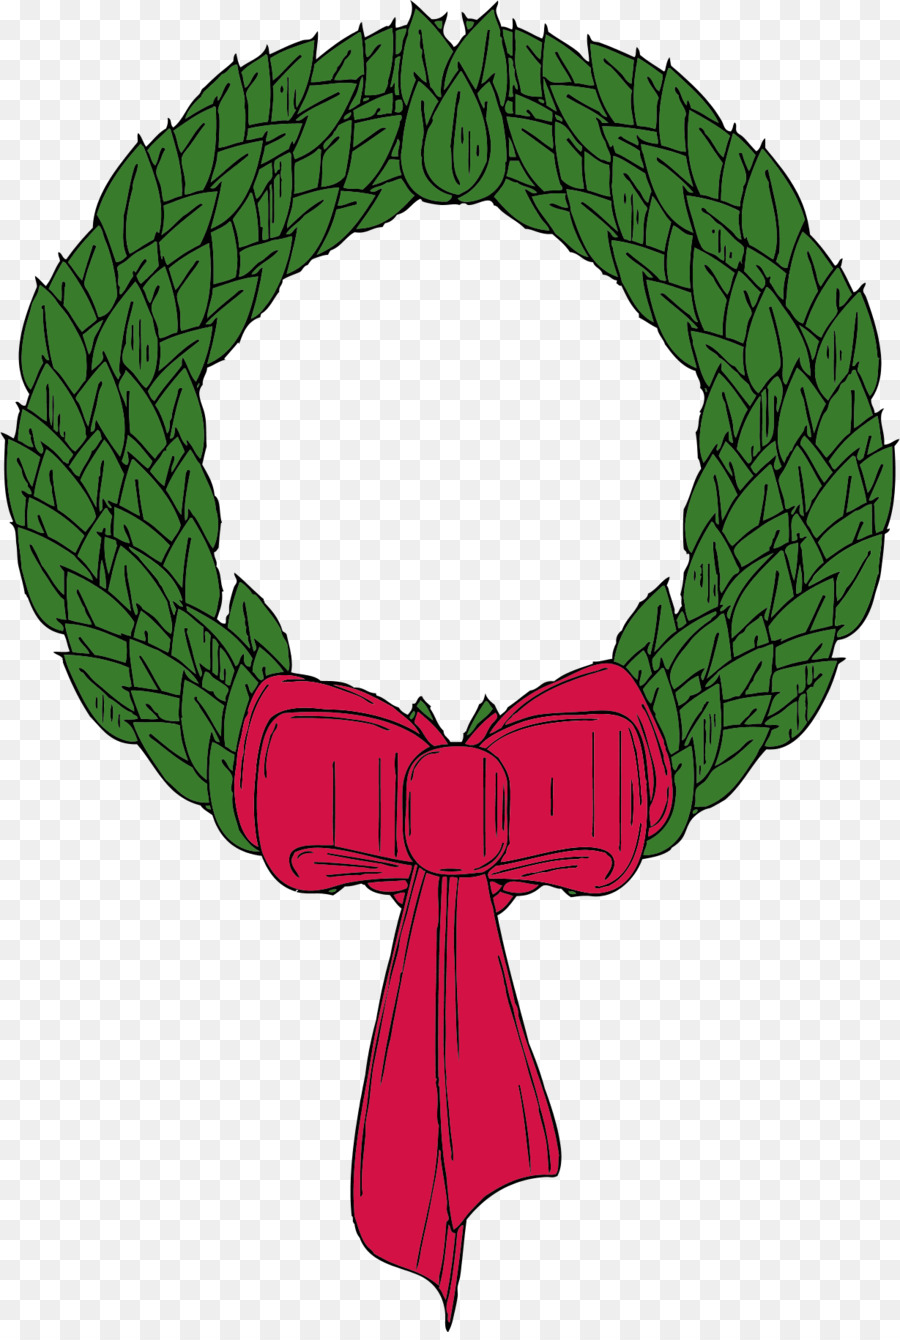 wreath christmas garland clip art elegant christmas clipart png rh kisspng com advent wreath clip art free advent wreath clipart black and white